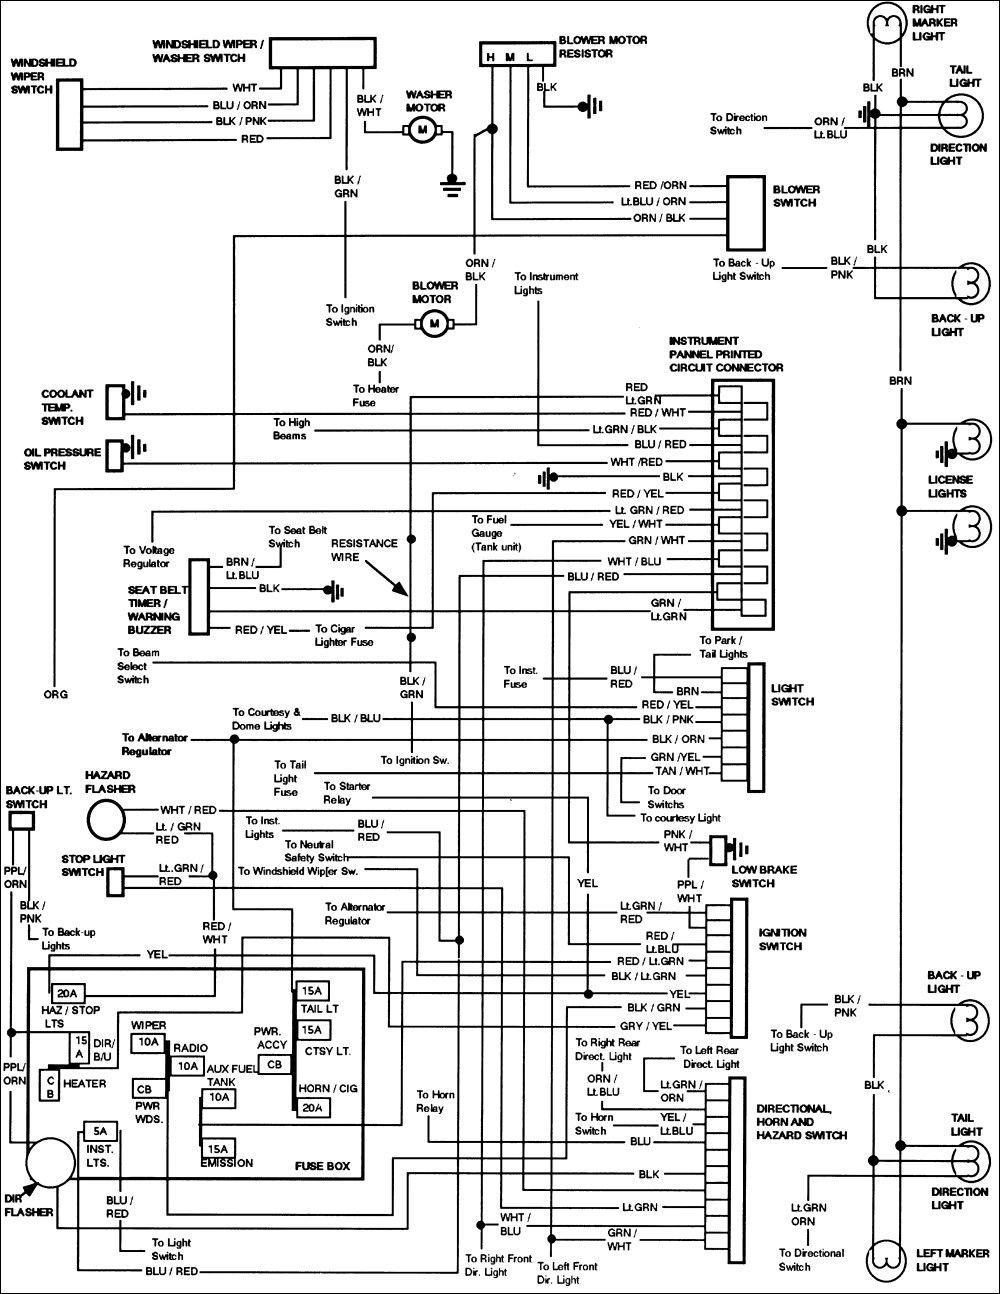 2001 ford f 150 headlight wiring diagram - auto electrical wiring diagram  wiring diagram